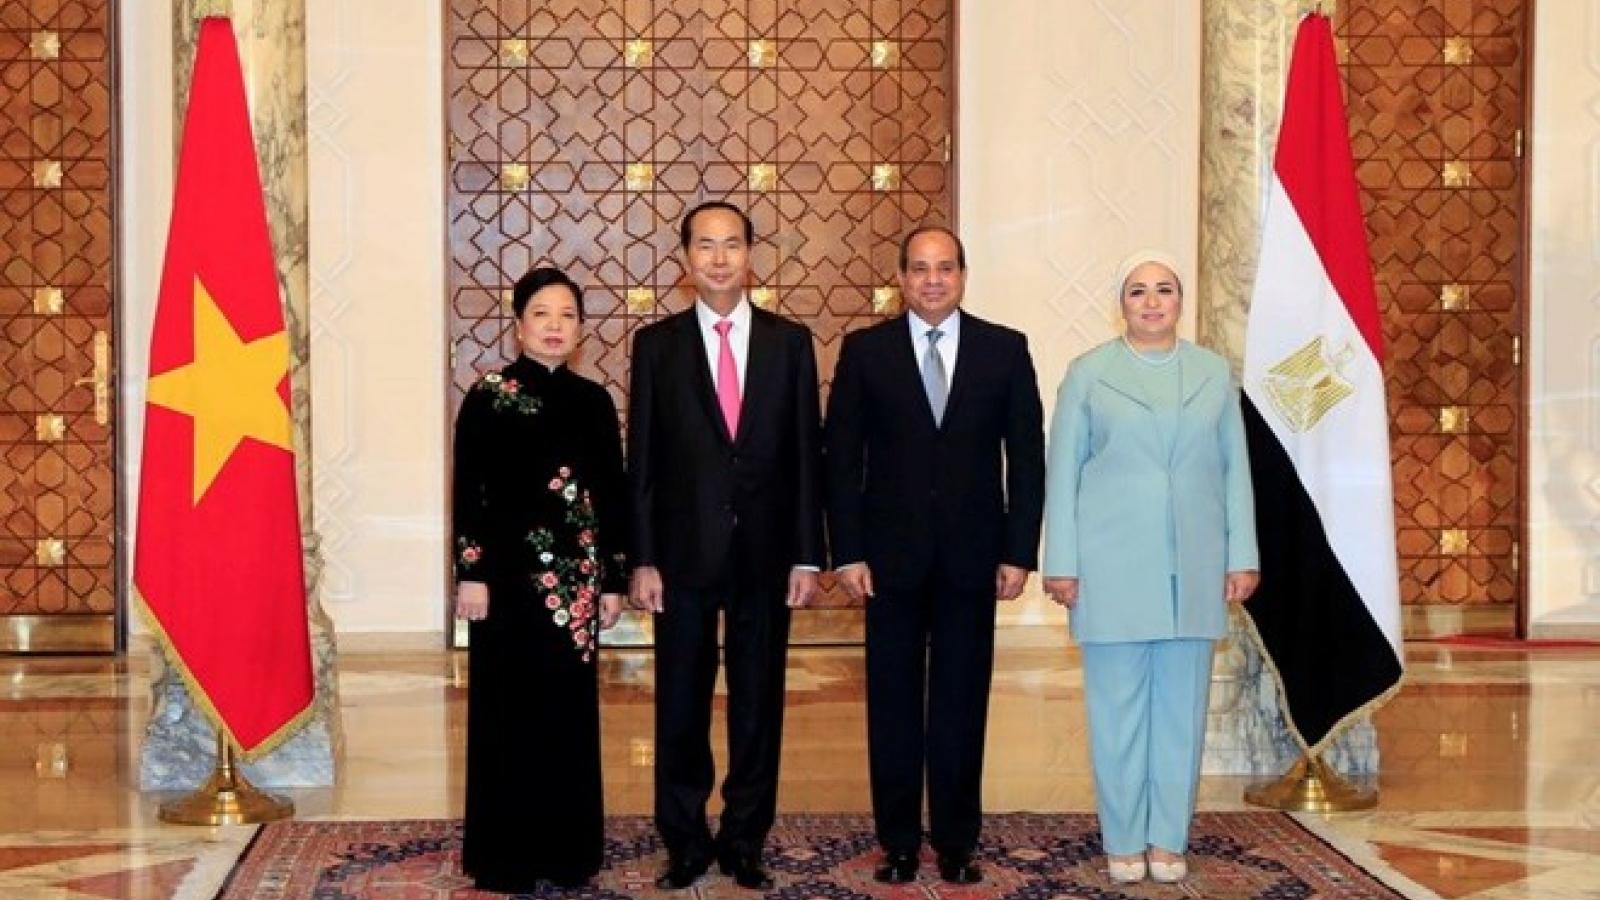 President's visits to Ethiopia, Egypt record upbeat outcome